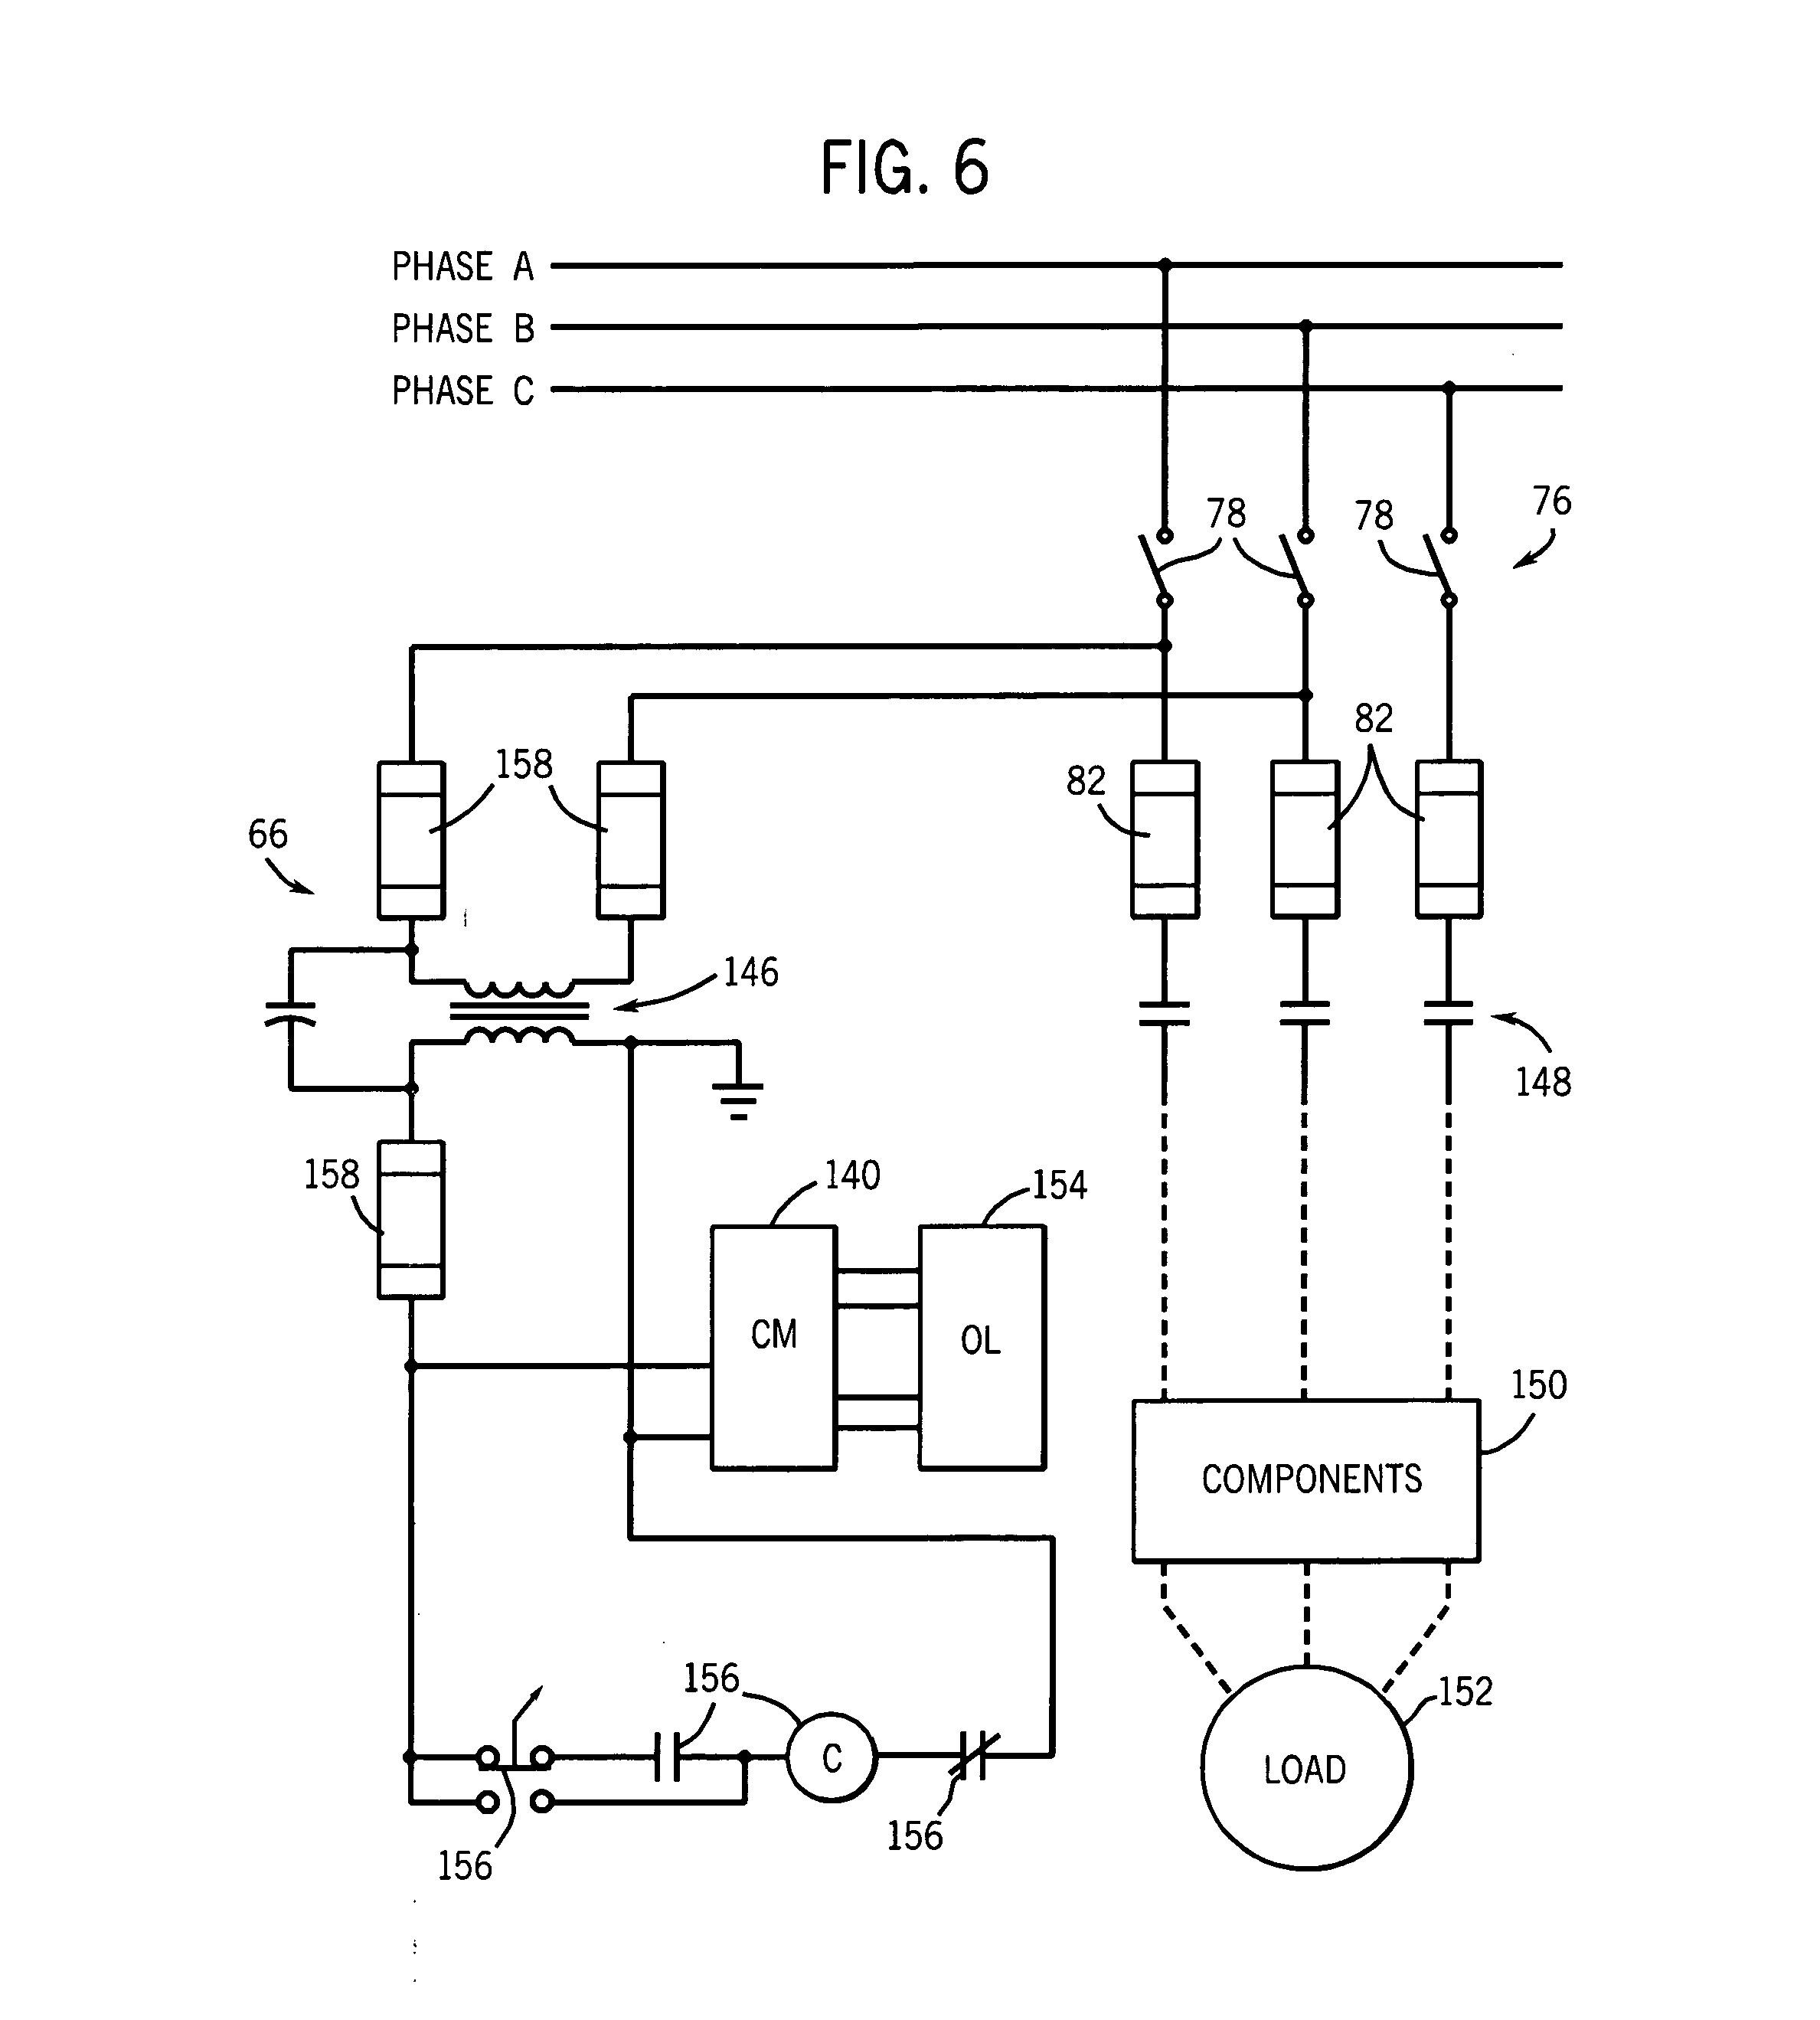 Push Button Station Wiring Diagram